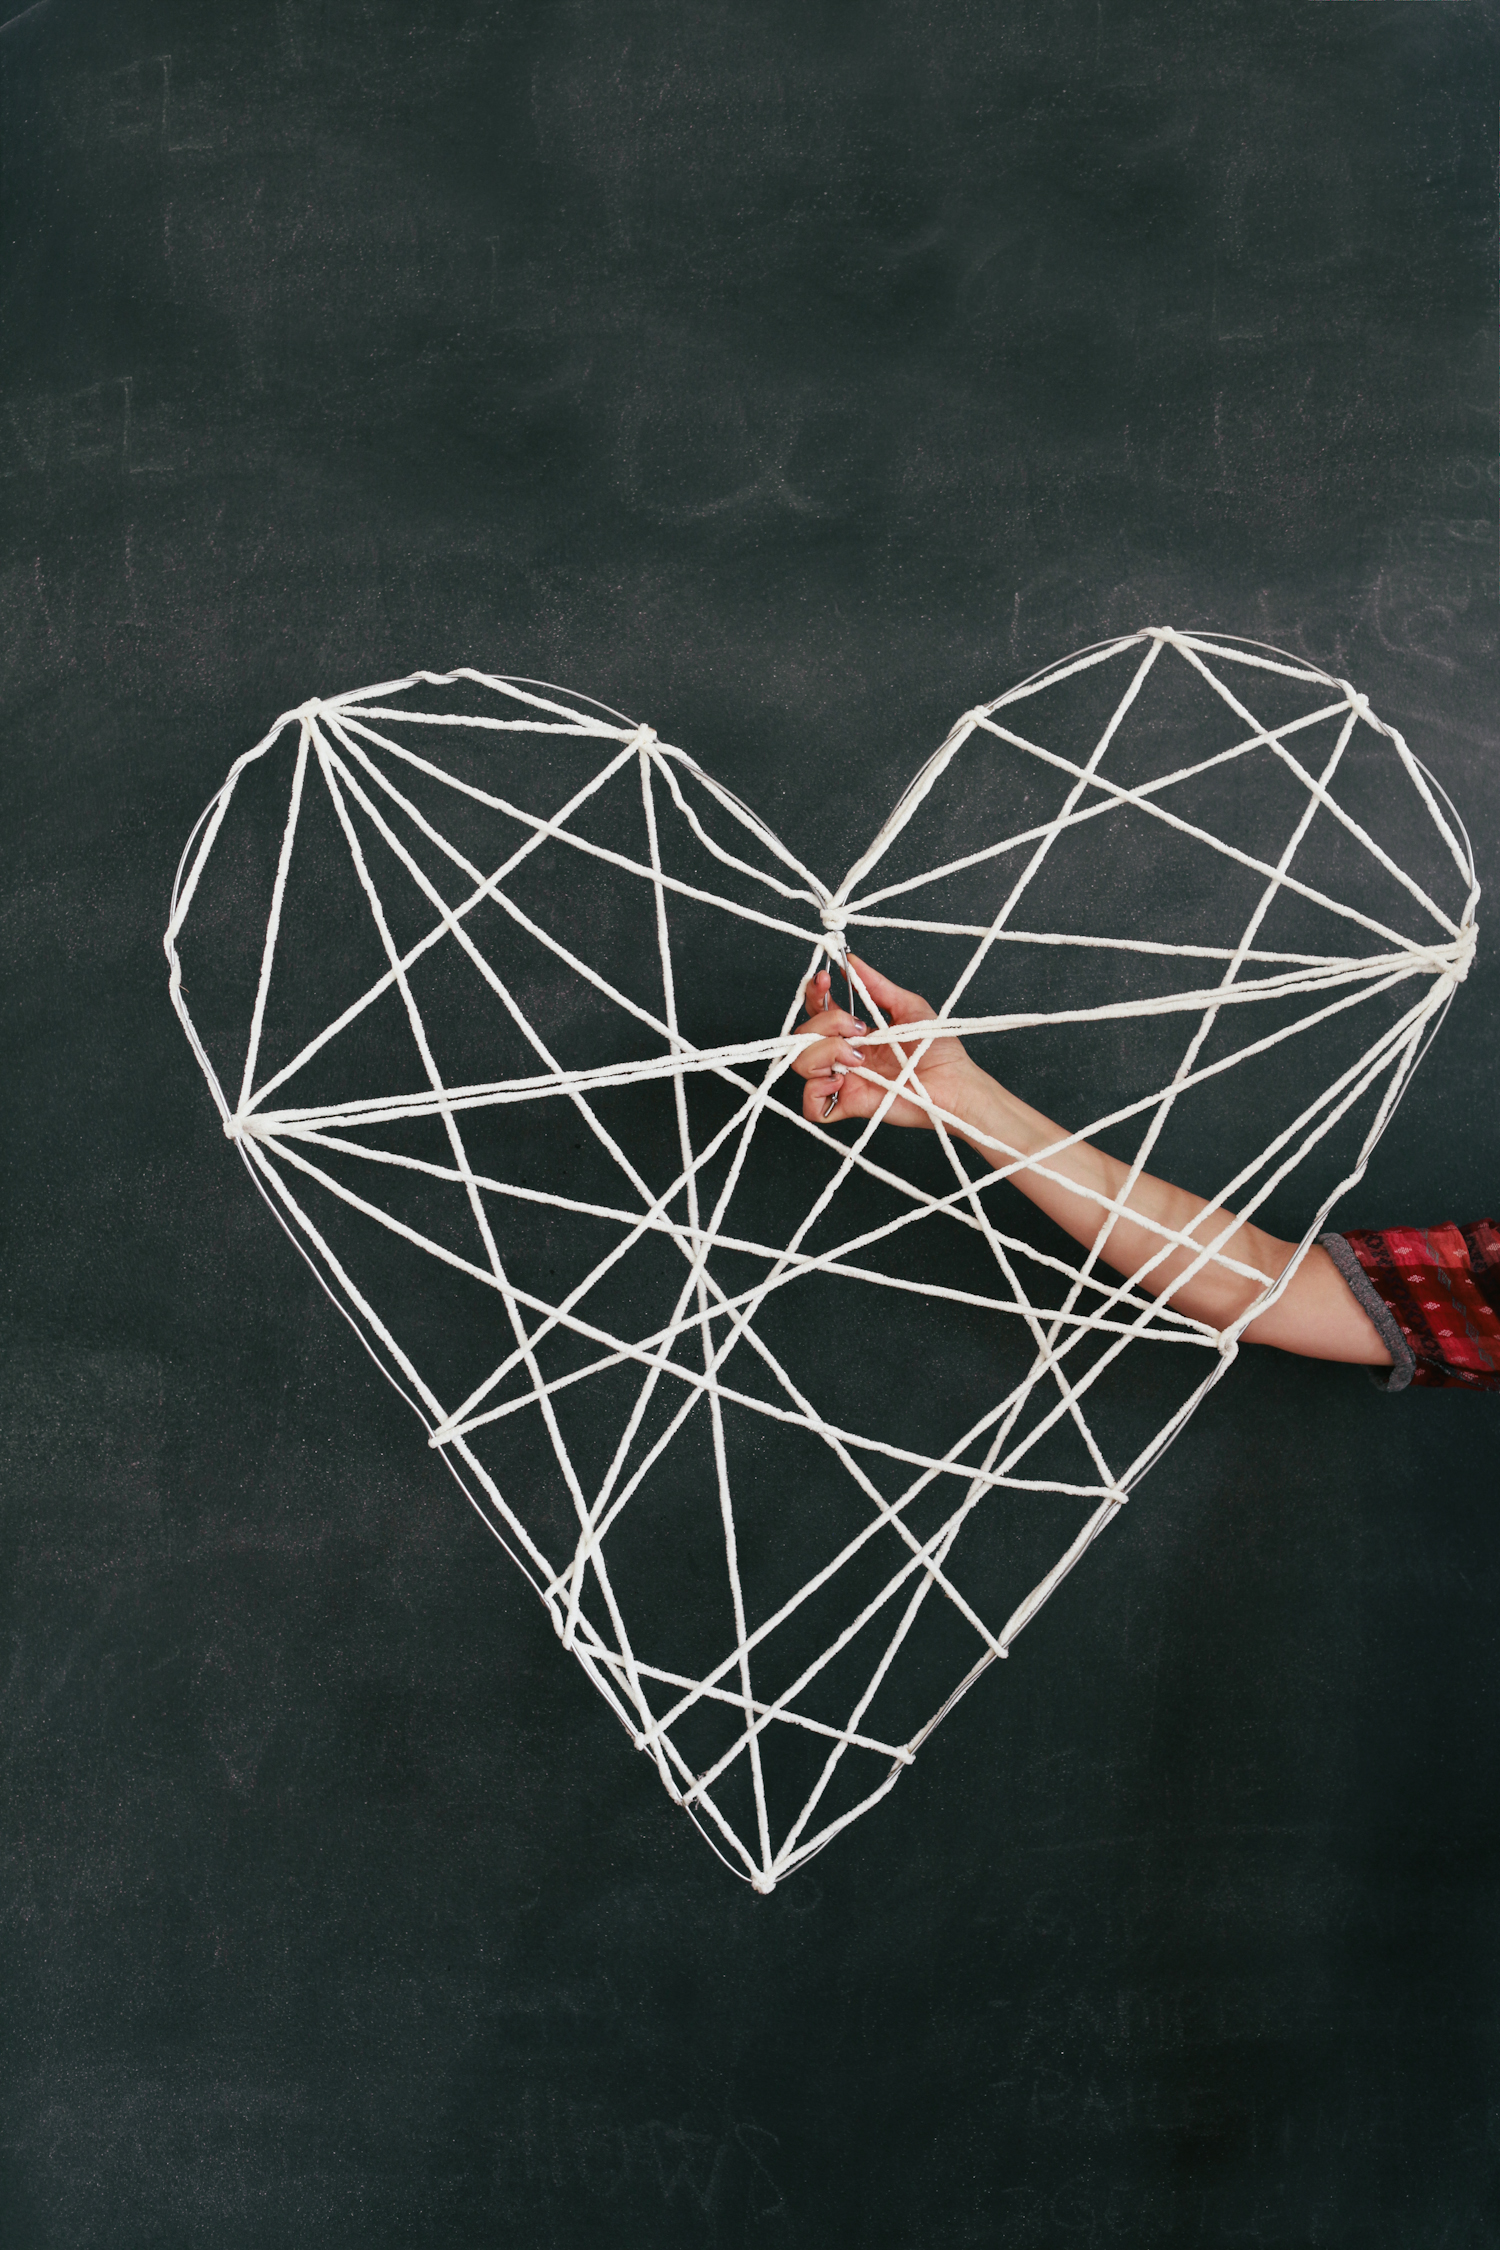 diy wired heart.jpeg